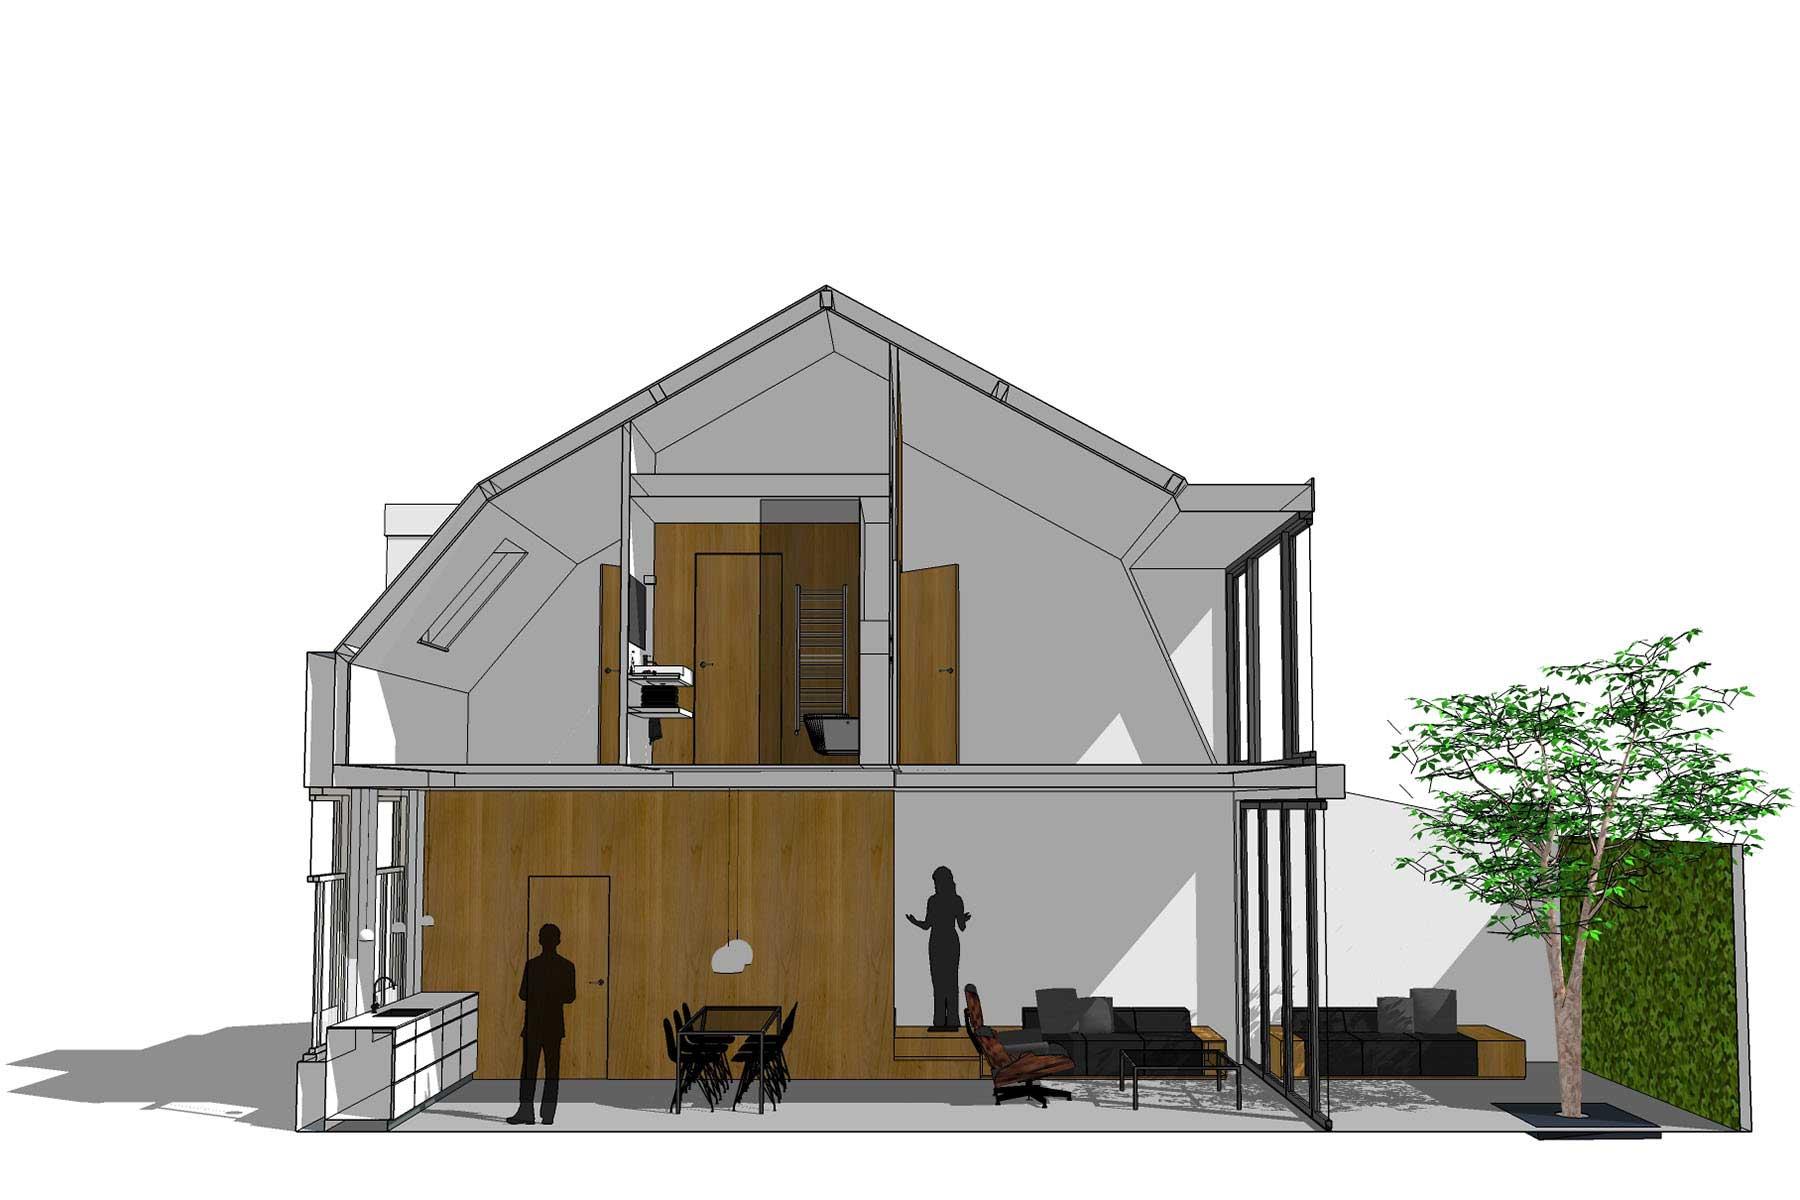 8A Architecten - Verbouwing en interieur arbeiderswoning tot 'Pied a Terre', Leiden